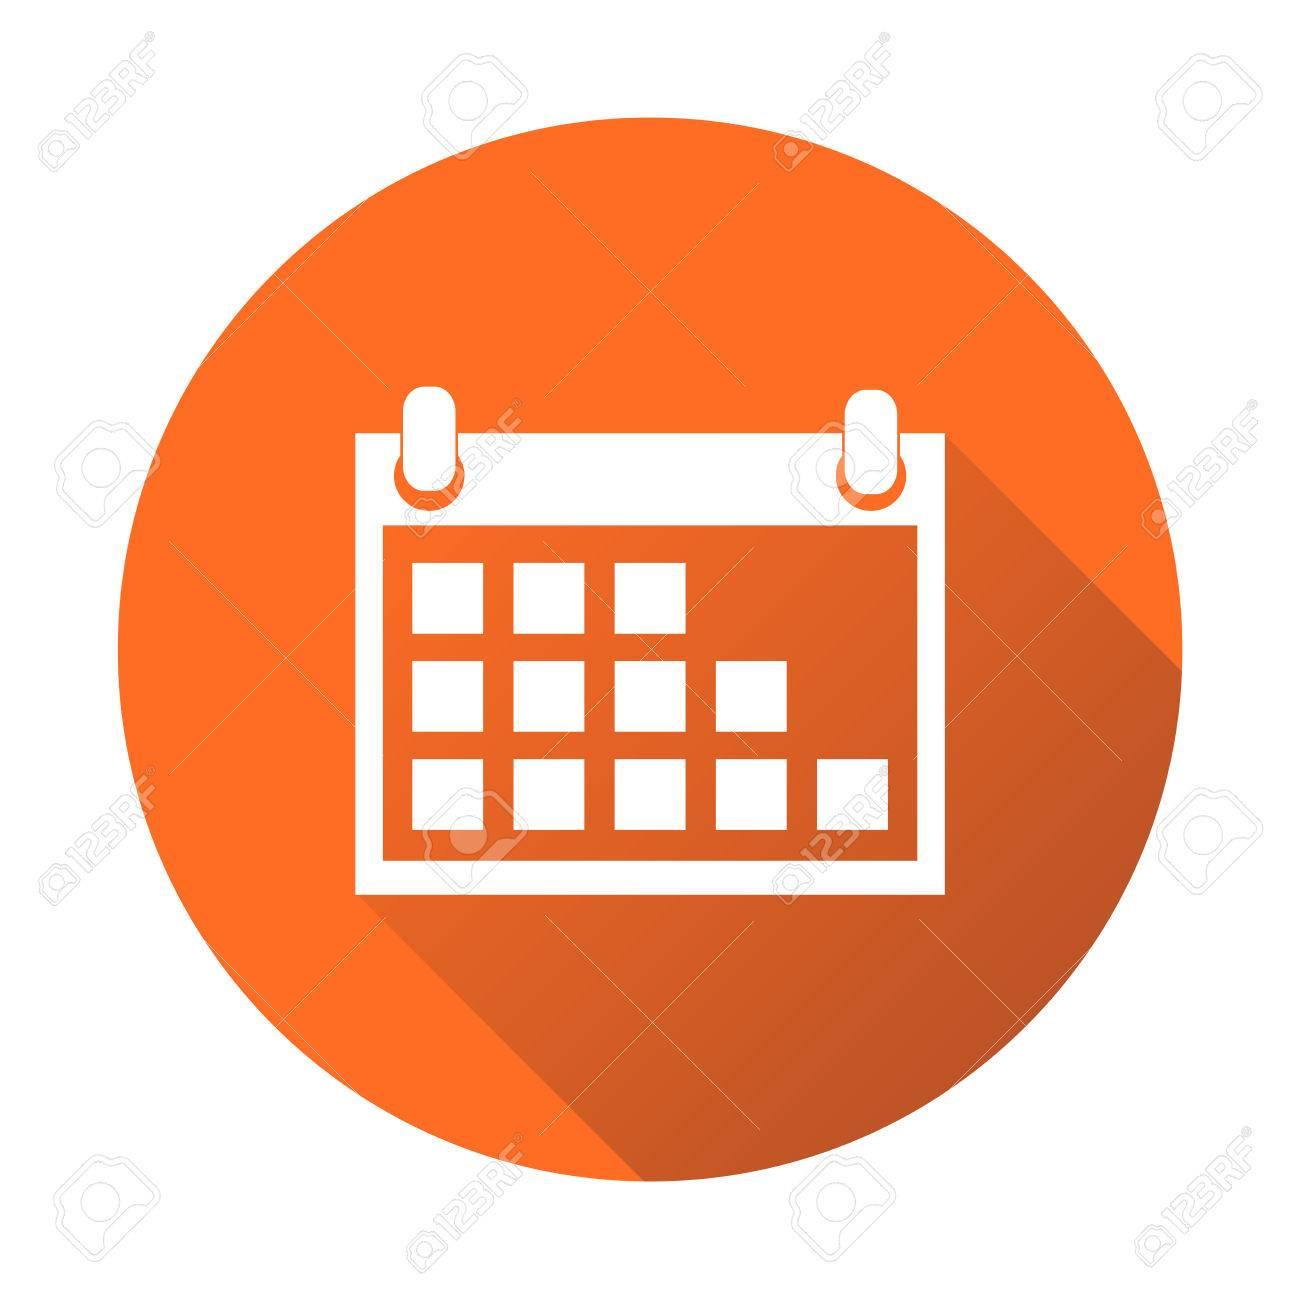 Calendar Icon On Orange Round Background, Vector Illustration inside Calendar Icon Round